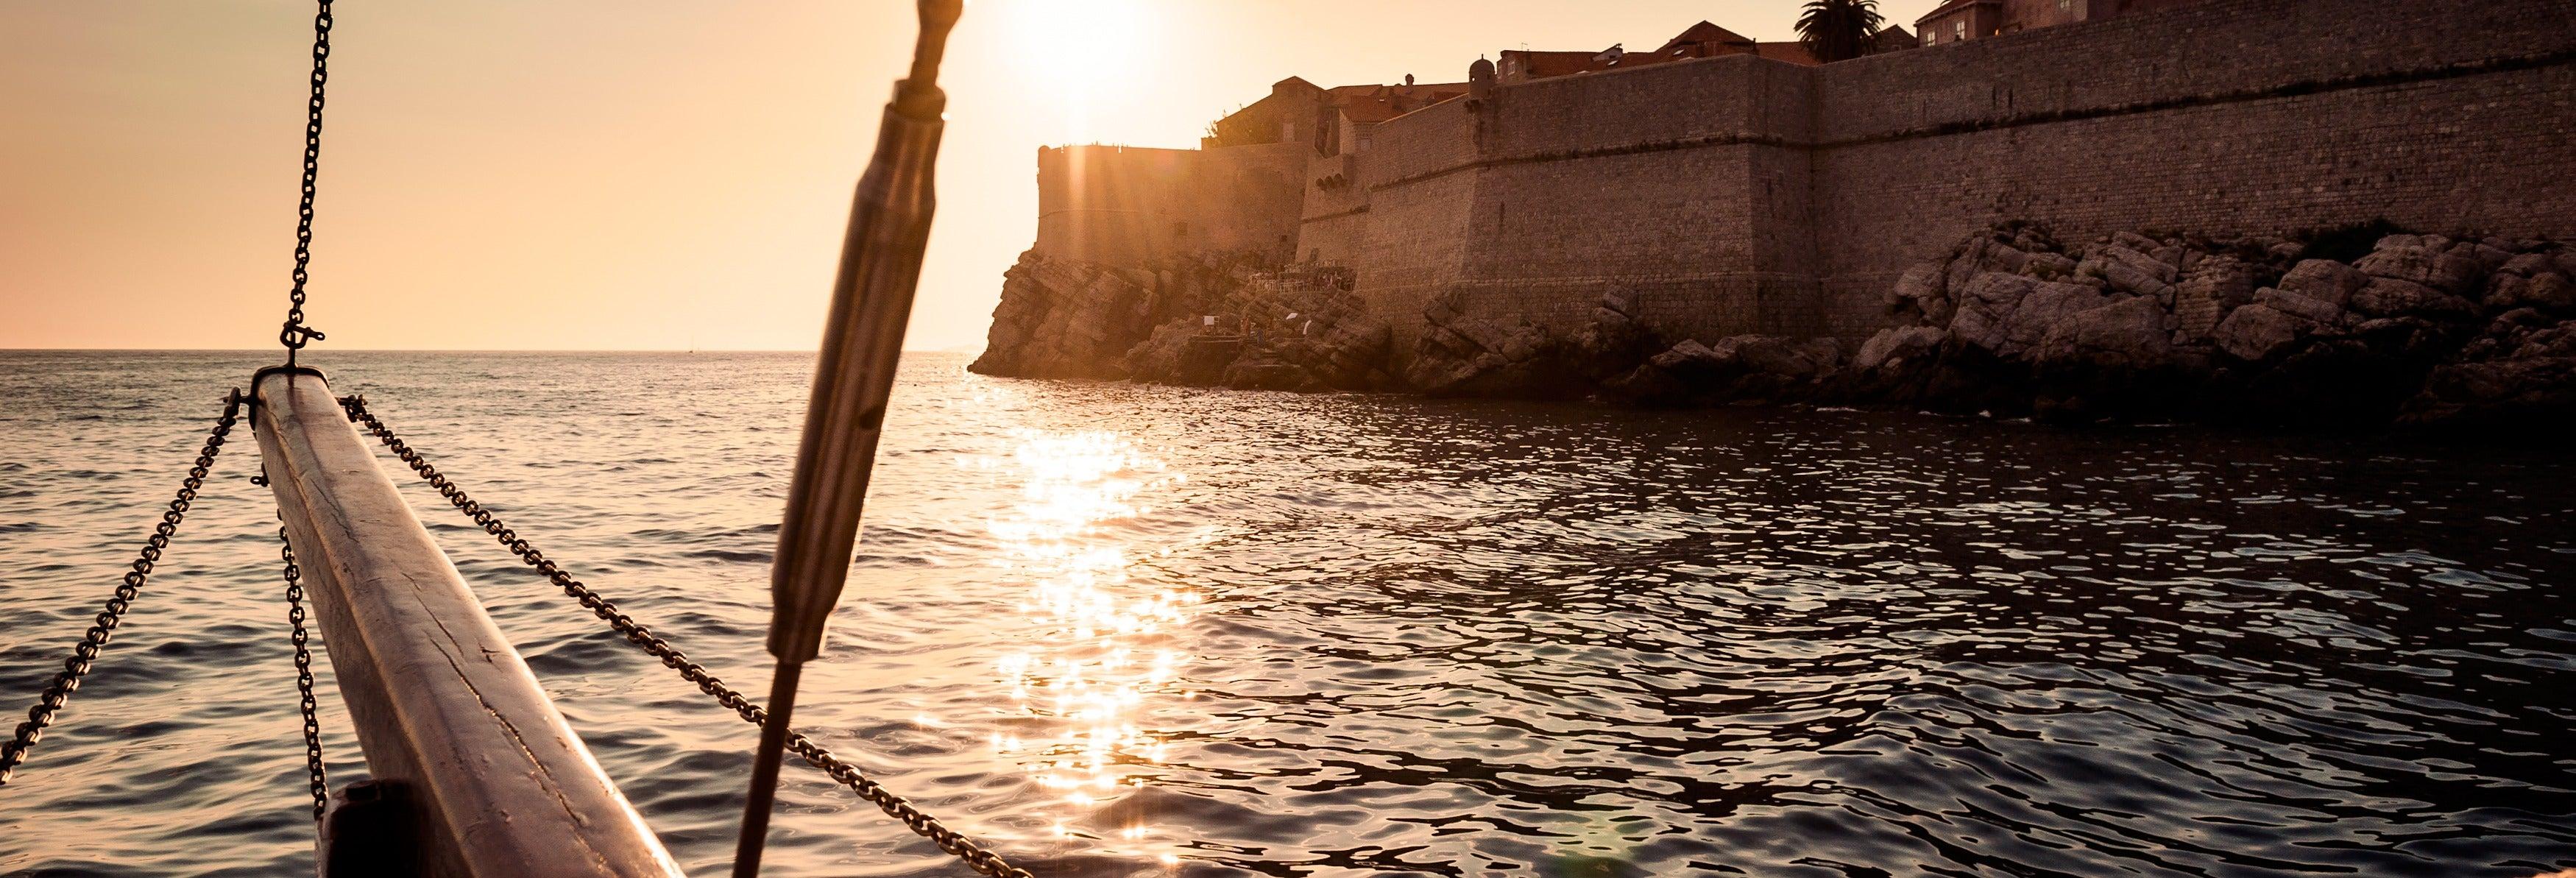 Crucero con cena por Dubrovnik